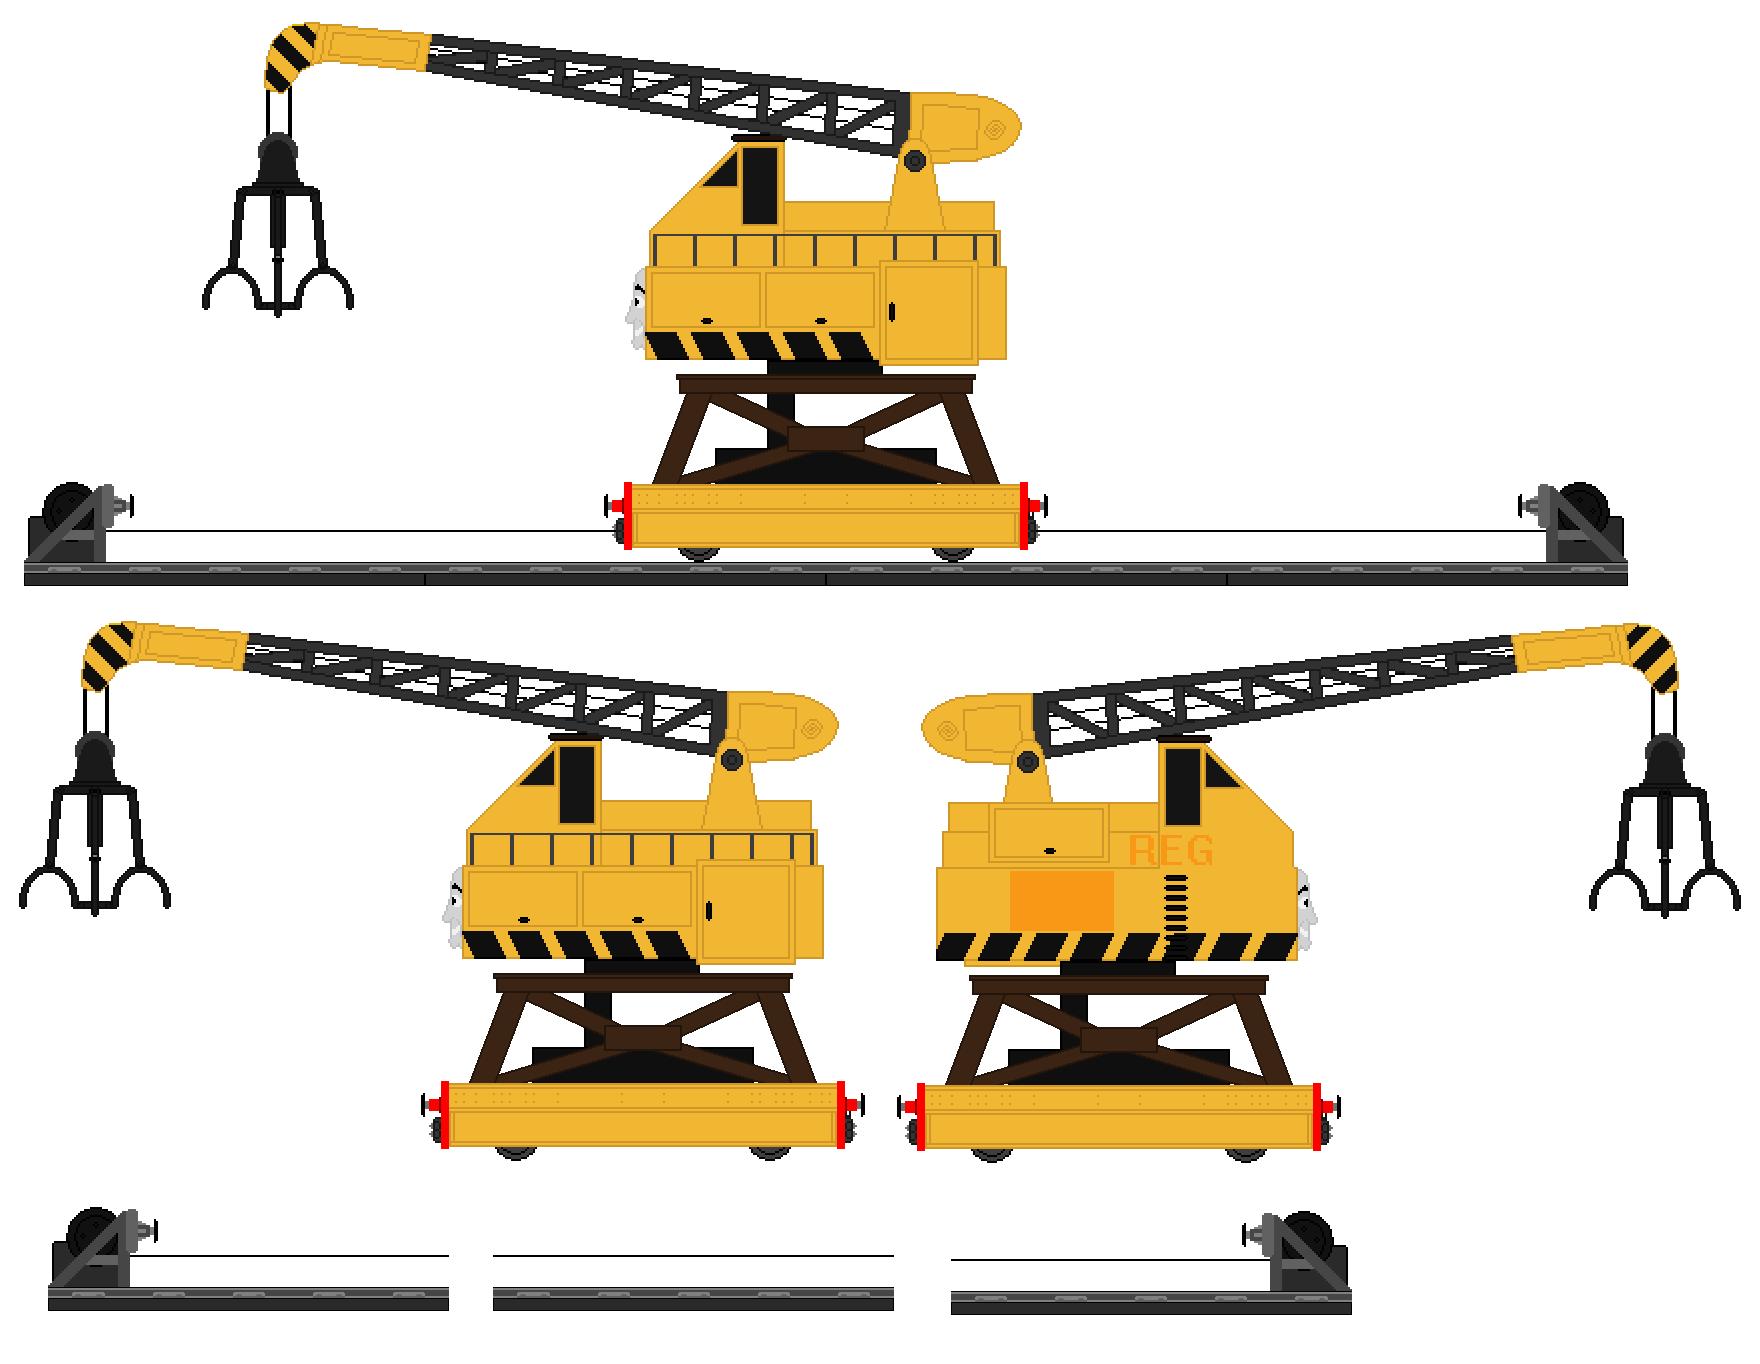 reg the scrapyard crane - photo #1